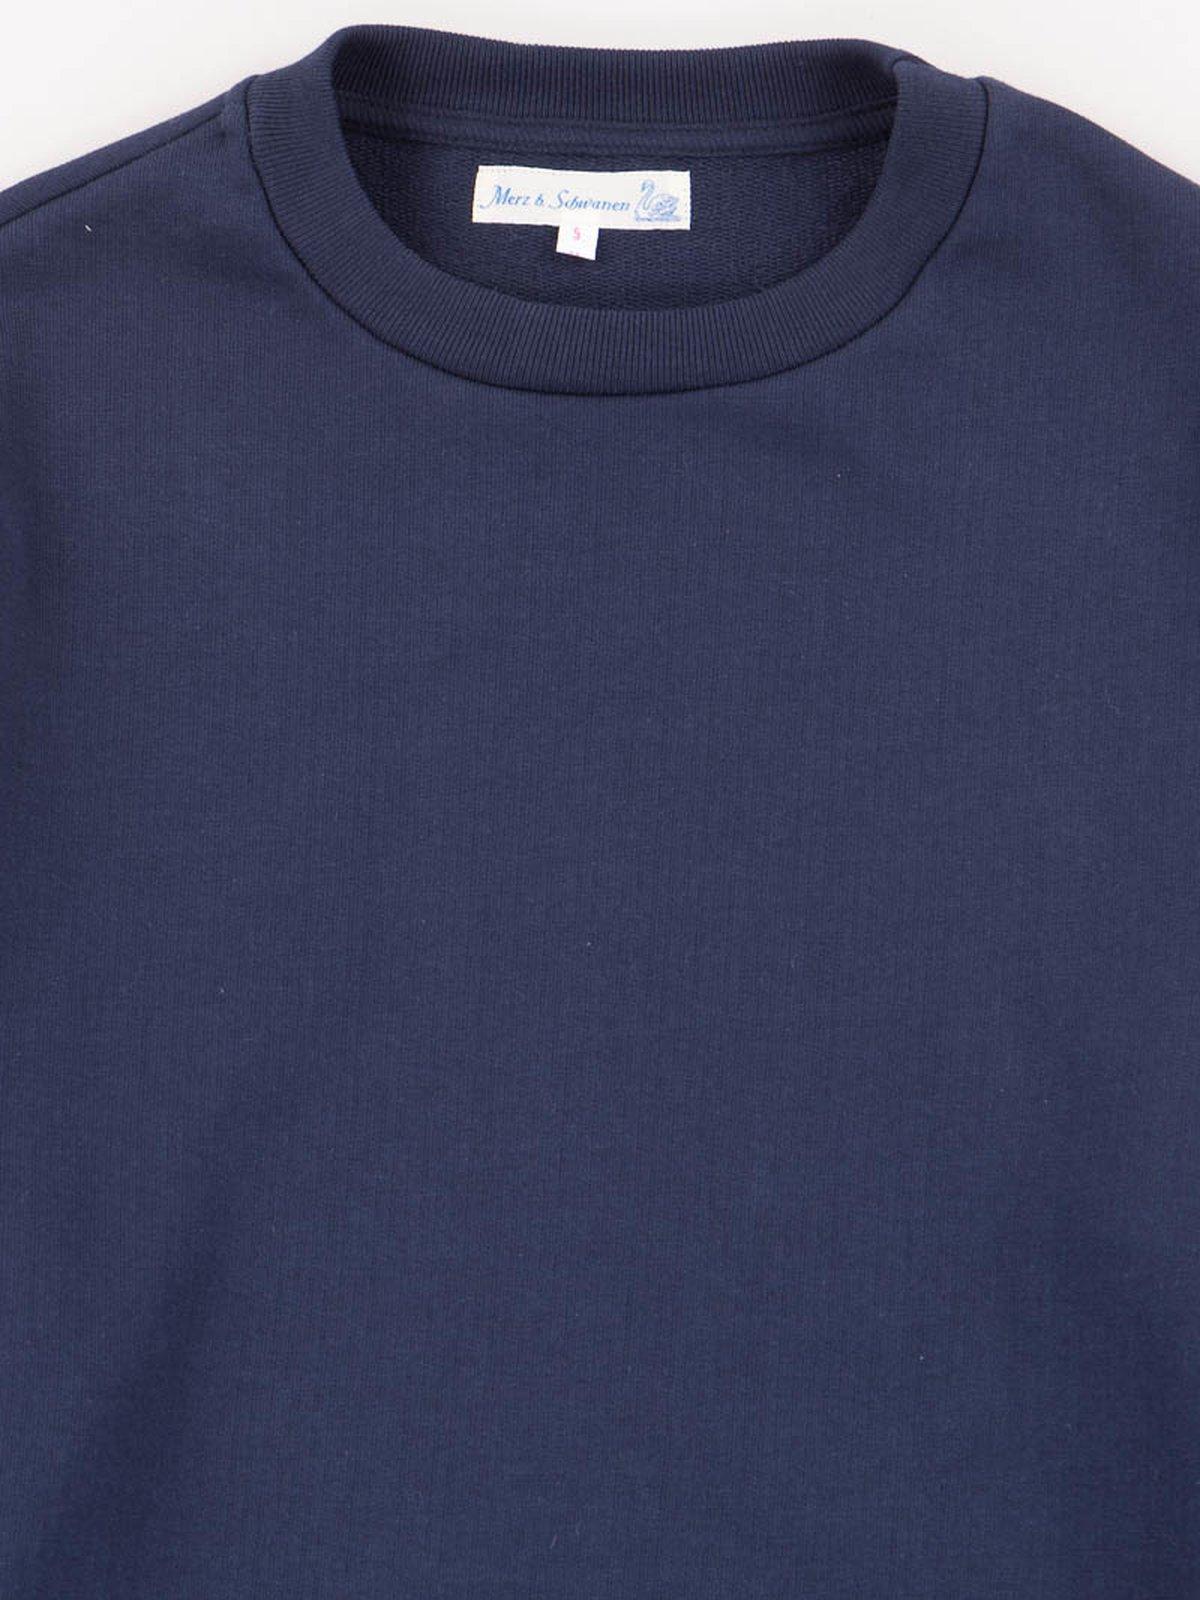 Ink Blue 346OS Organic Cotton Oversized Sweater - Image 2